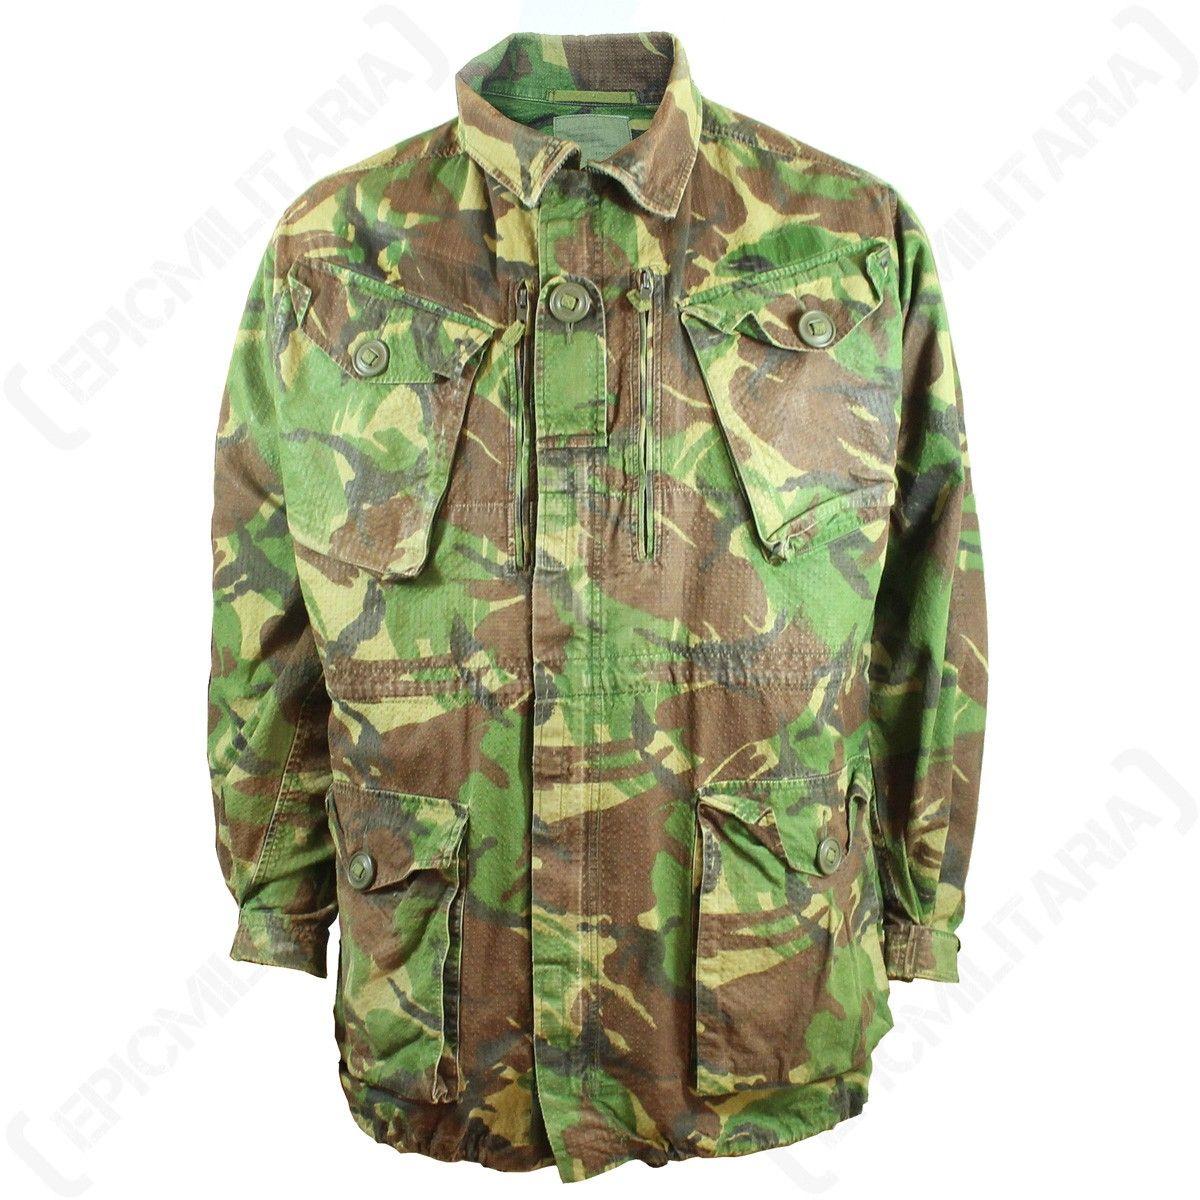 e79baf9f23cdd Original British DPM Rip Stop Field Jacket | Army Surplus Jackets ...